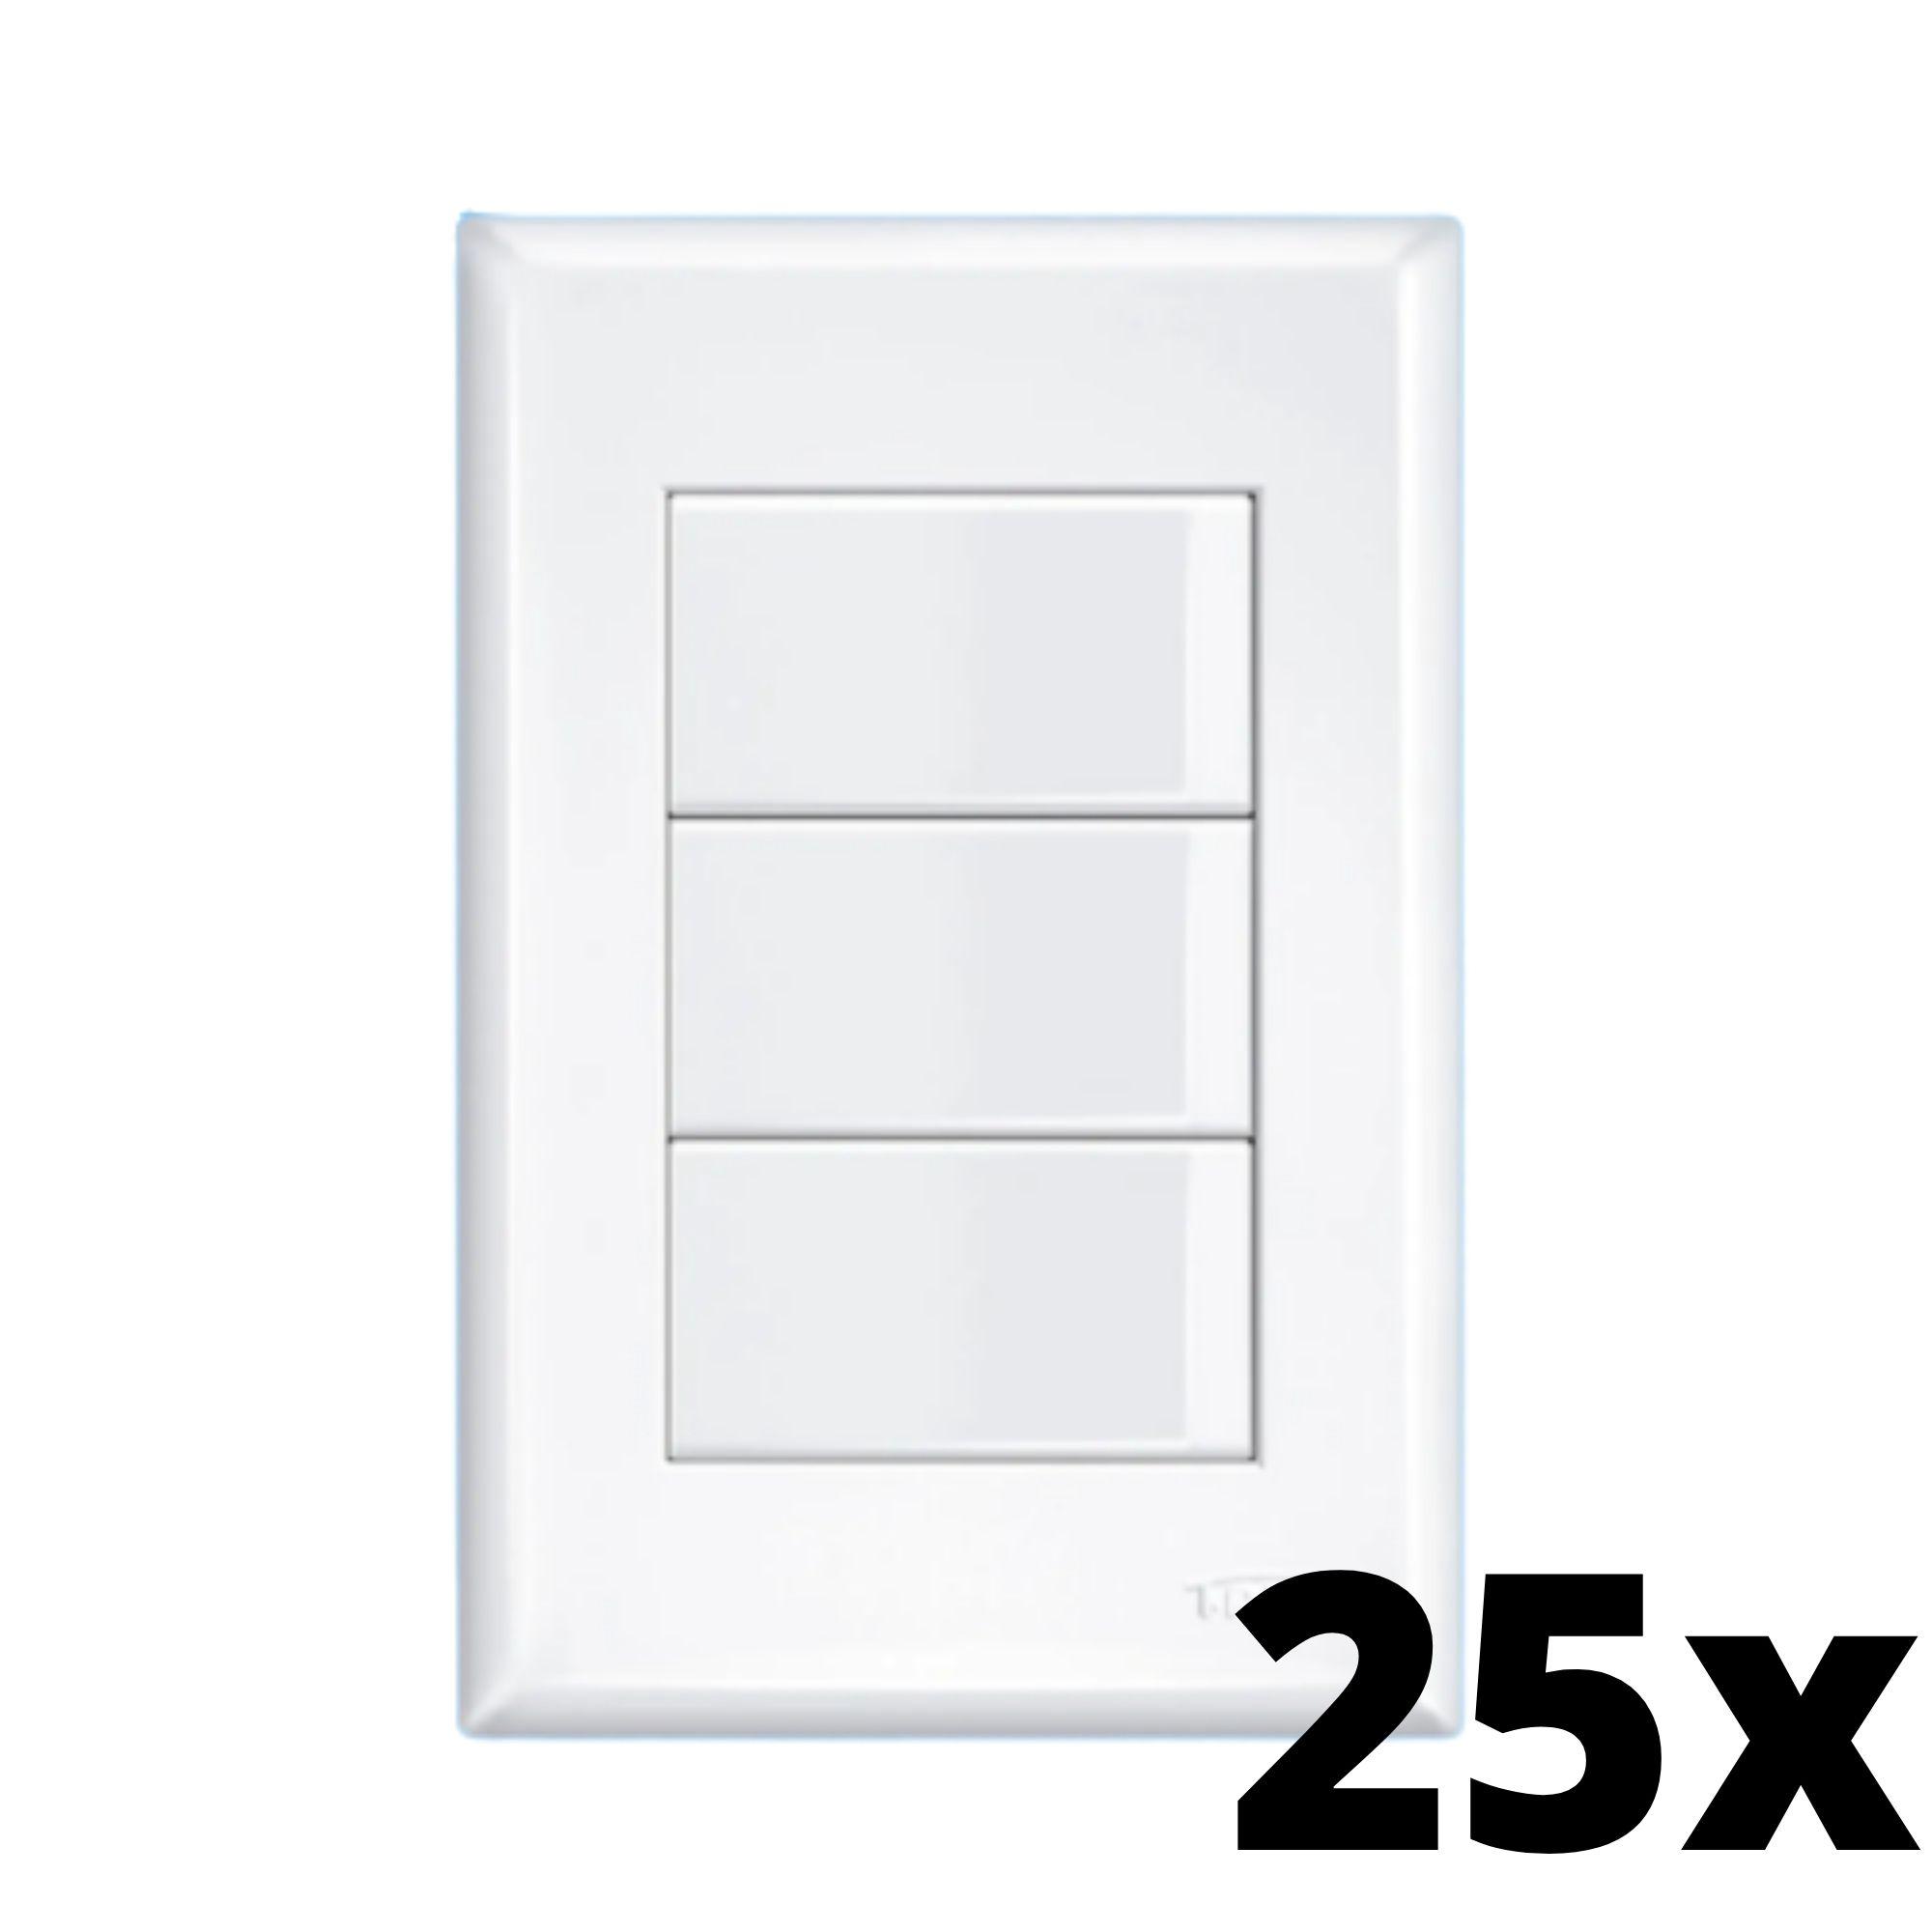 Kit 25 Evidence 3 Seções de Interruptor Simples Com Placa